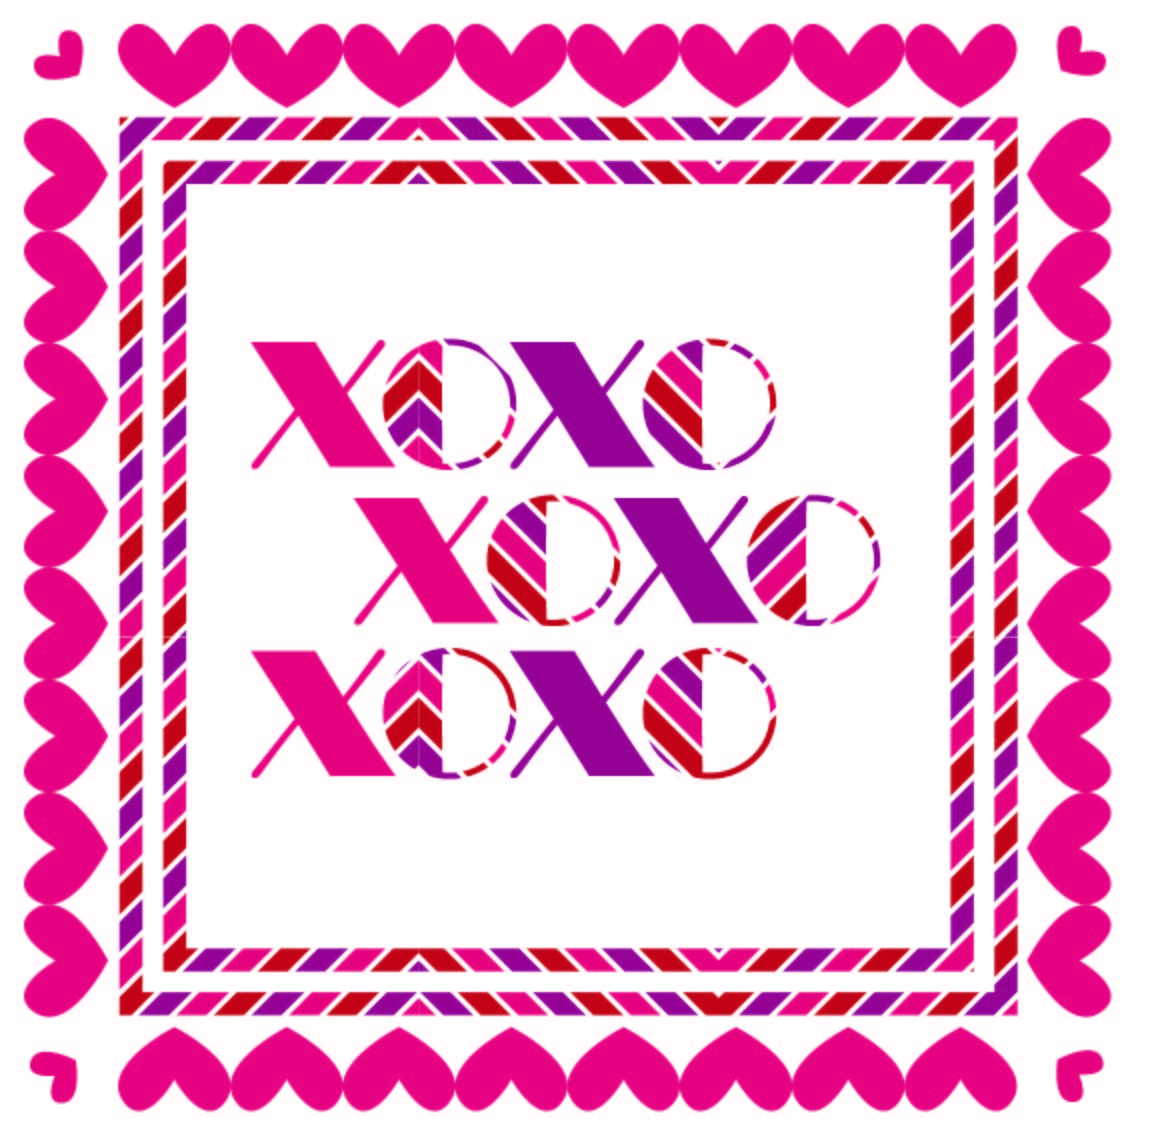 xoxo printable image-01